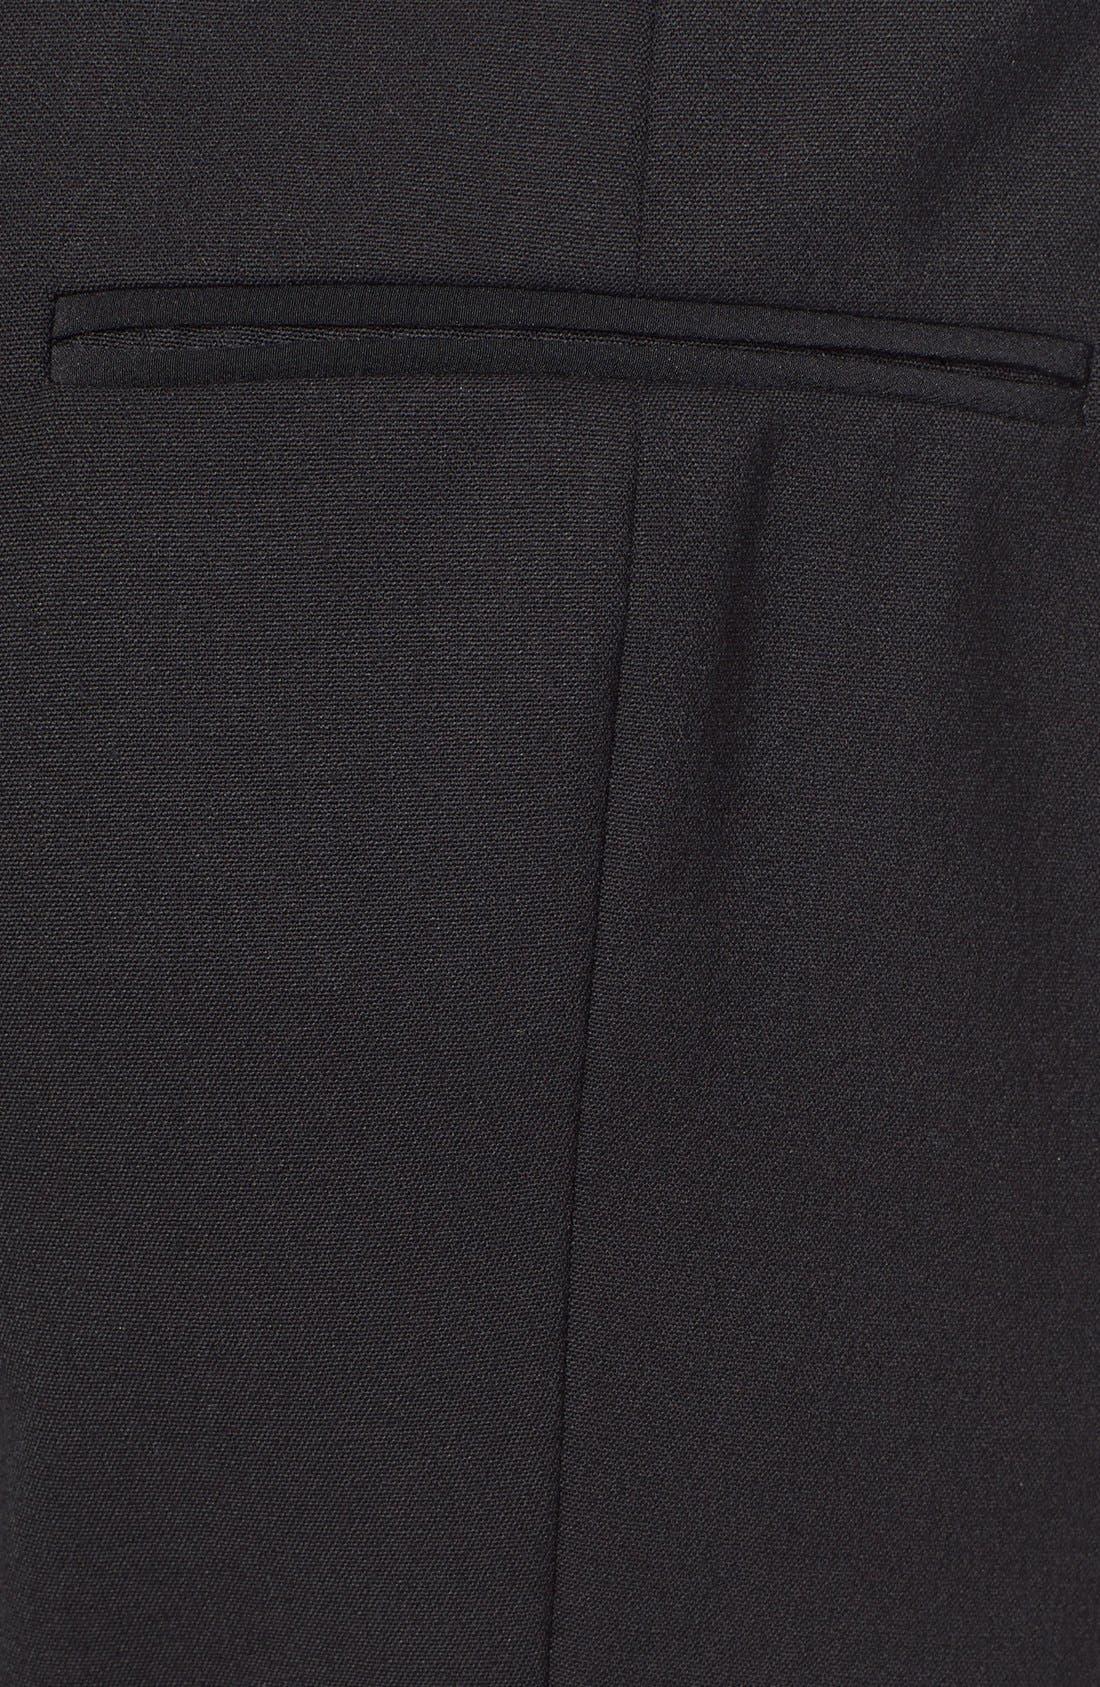 Alternate Image 3  - Jason Wu Stretch Gabardine Crop Pants